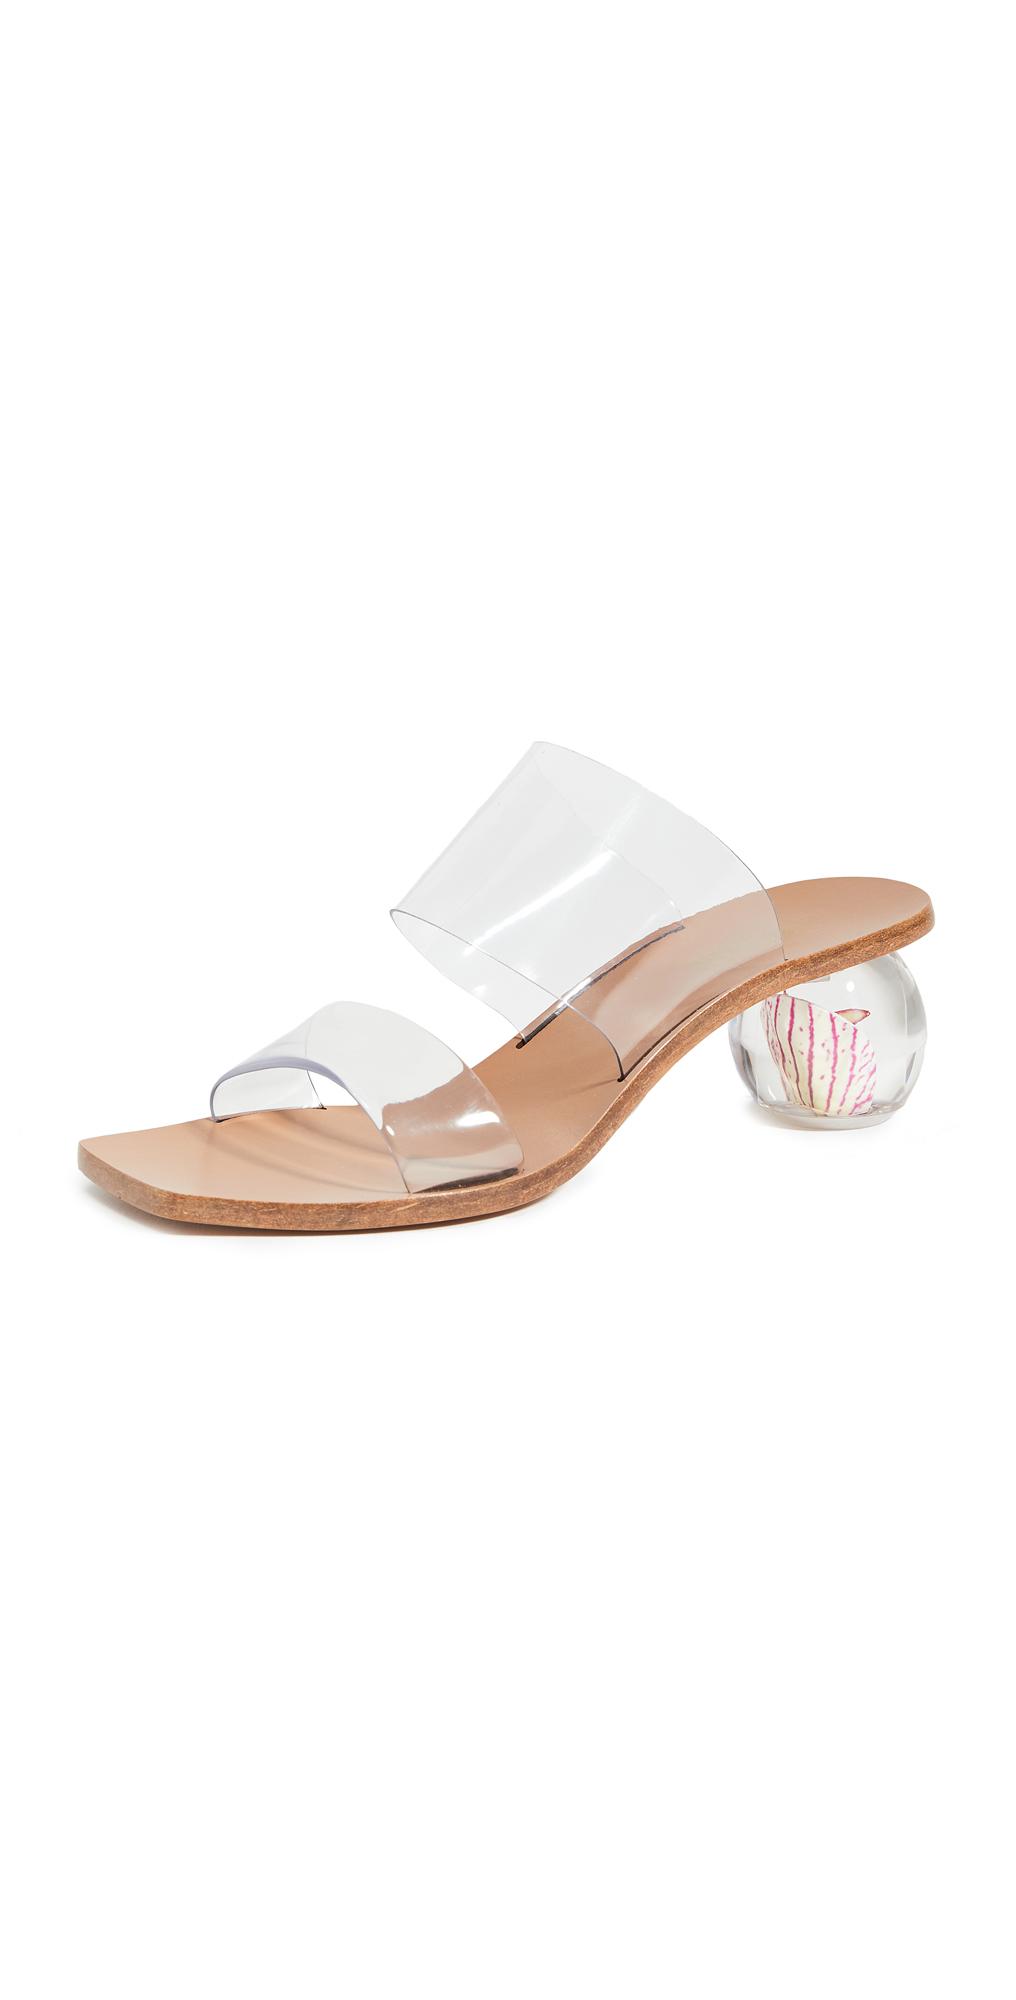 Cult Gaia Jila Flower Heel Sandals